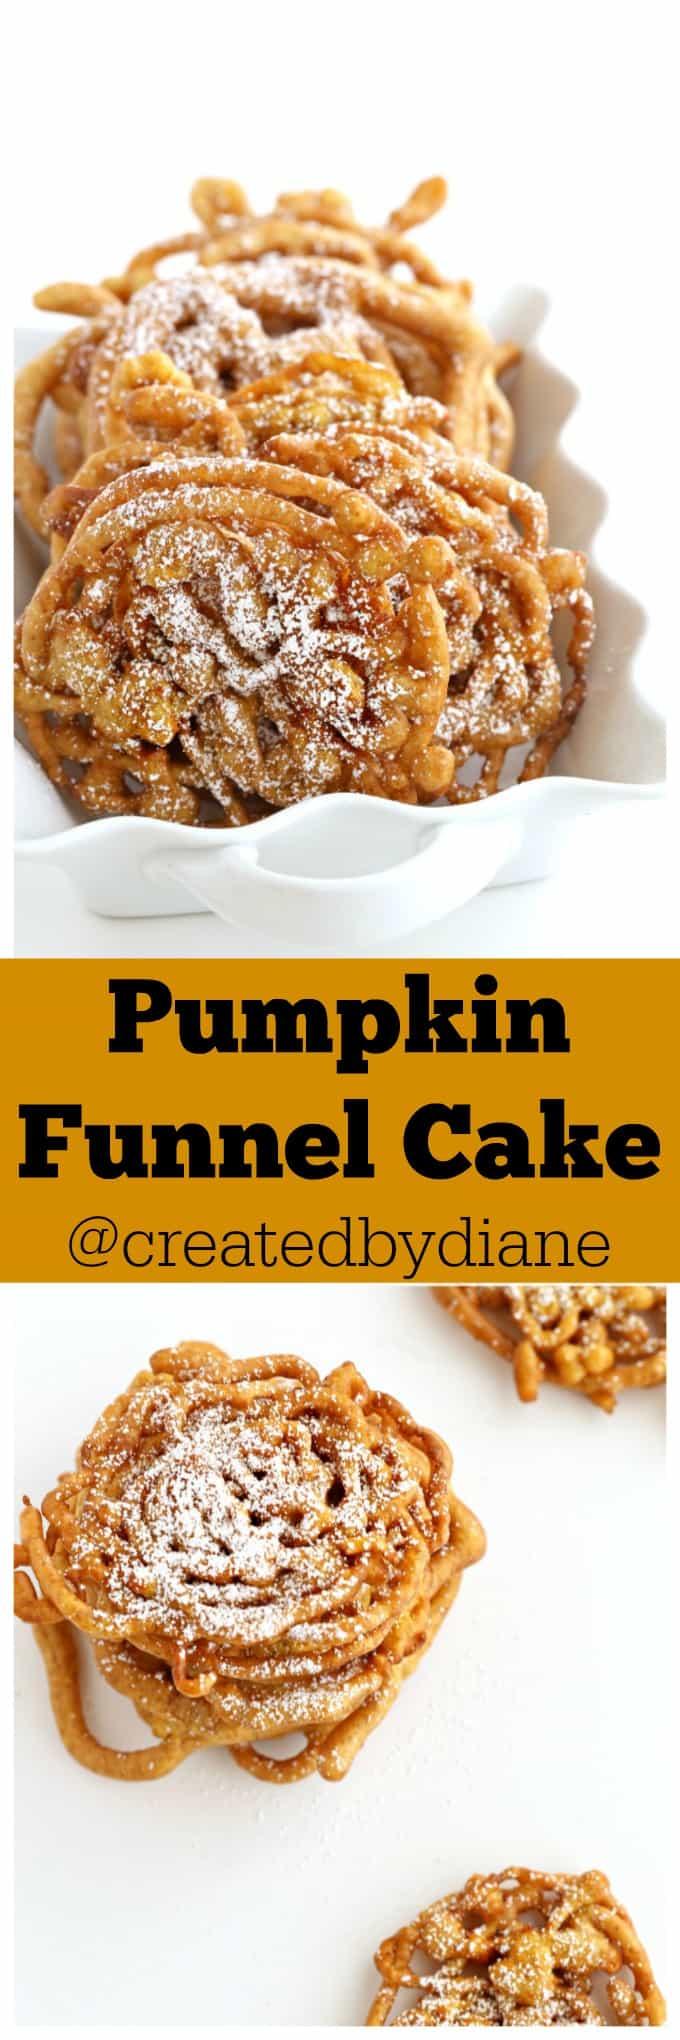 Pumpkin Funnel Cake @createdbydiane